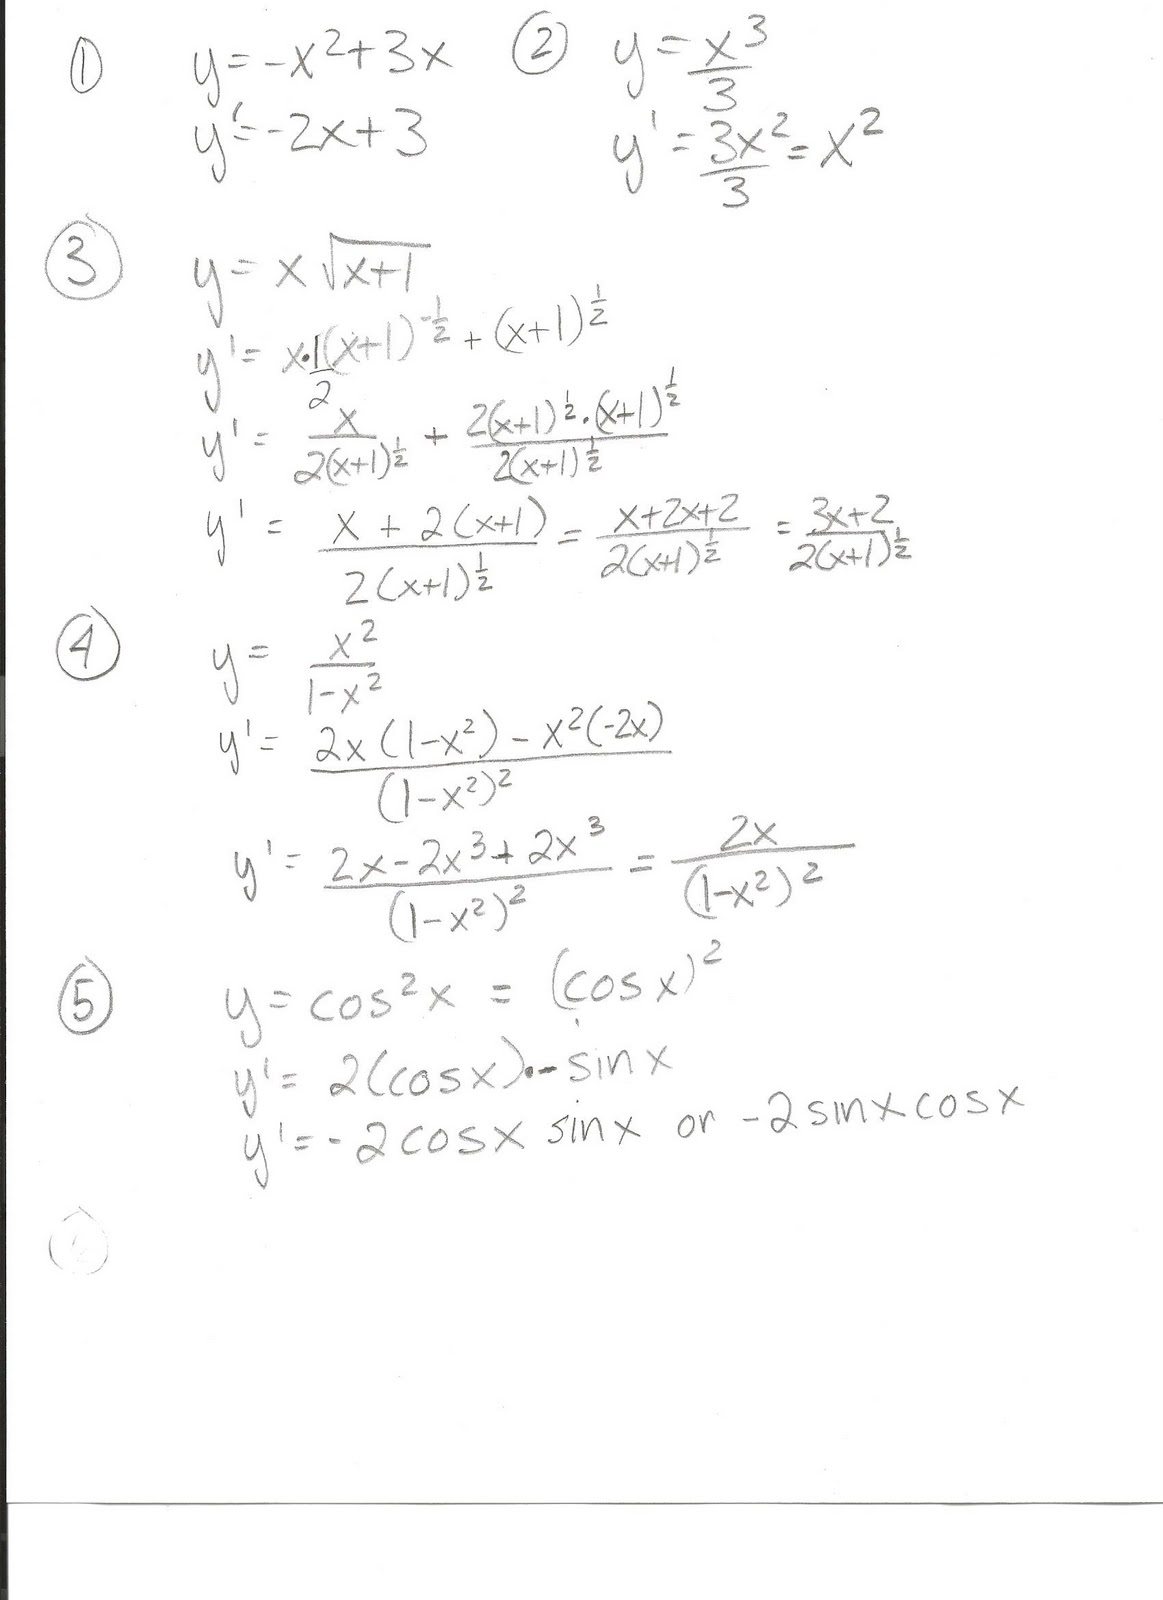 Glencoe Algebra 1 Chapter 5 Practice Test Answers